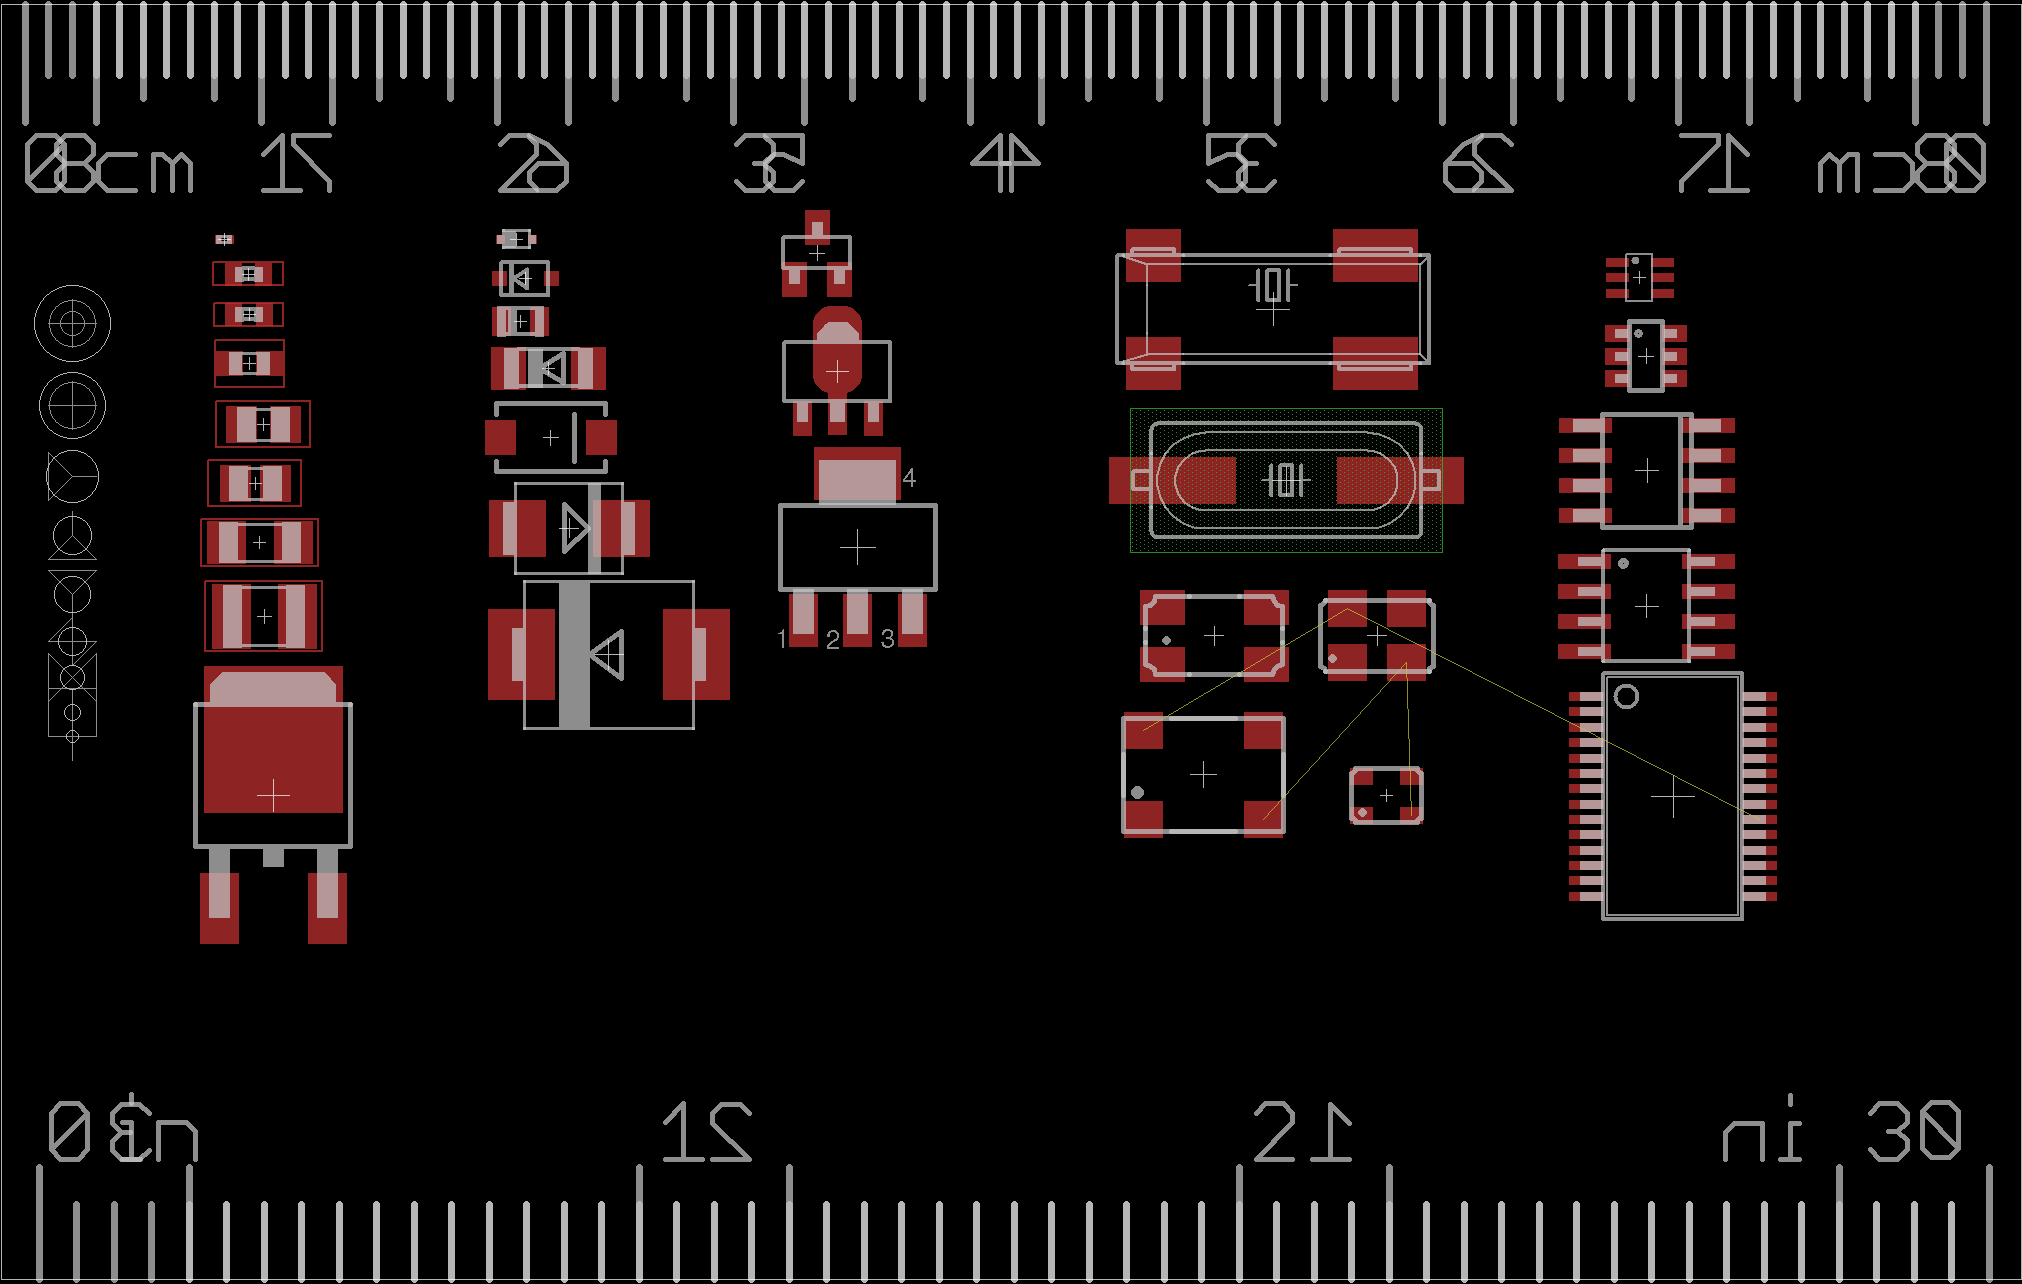 Open Source Pcb Ruler - Black Electronics